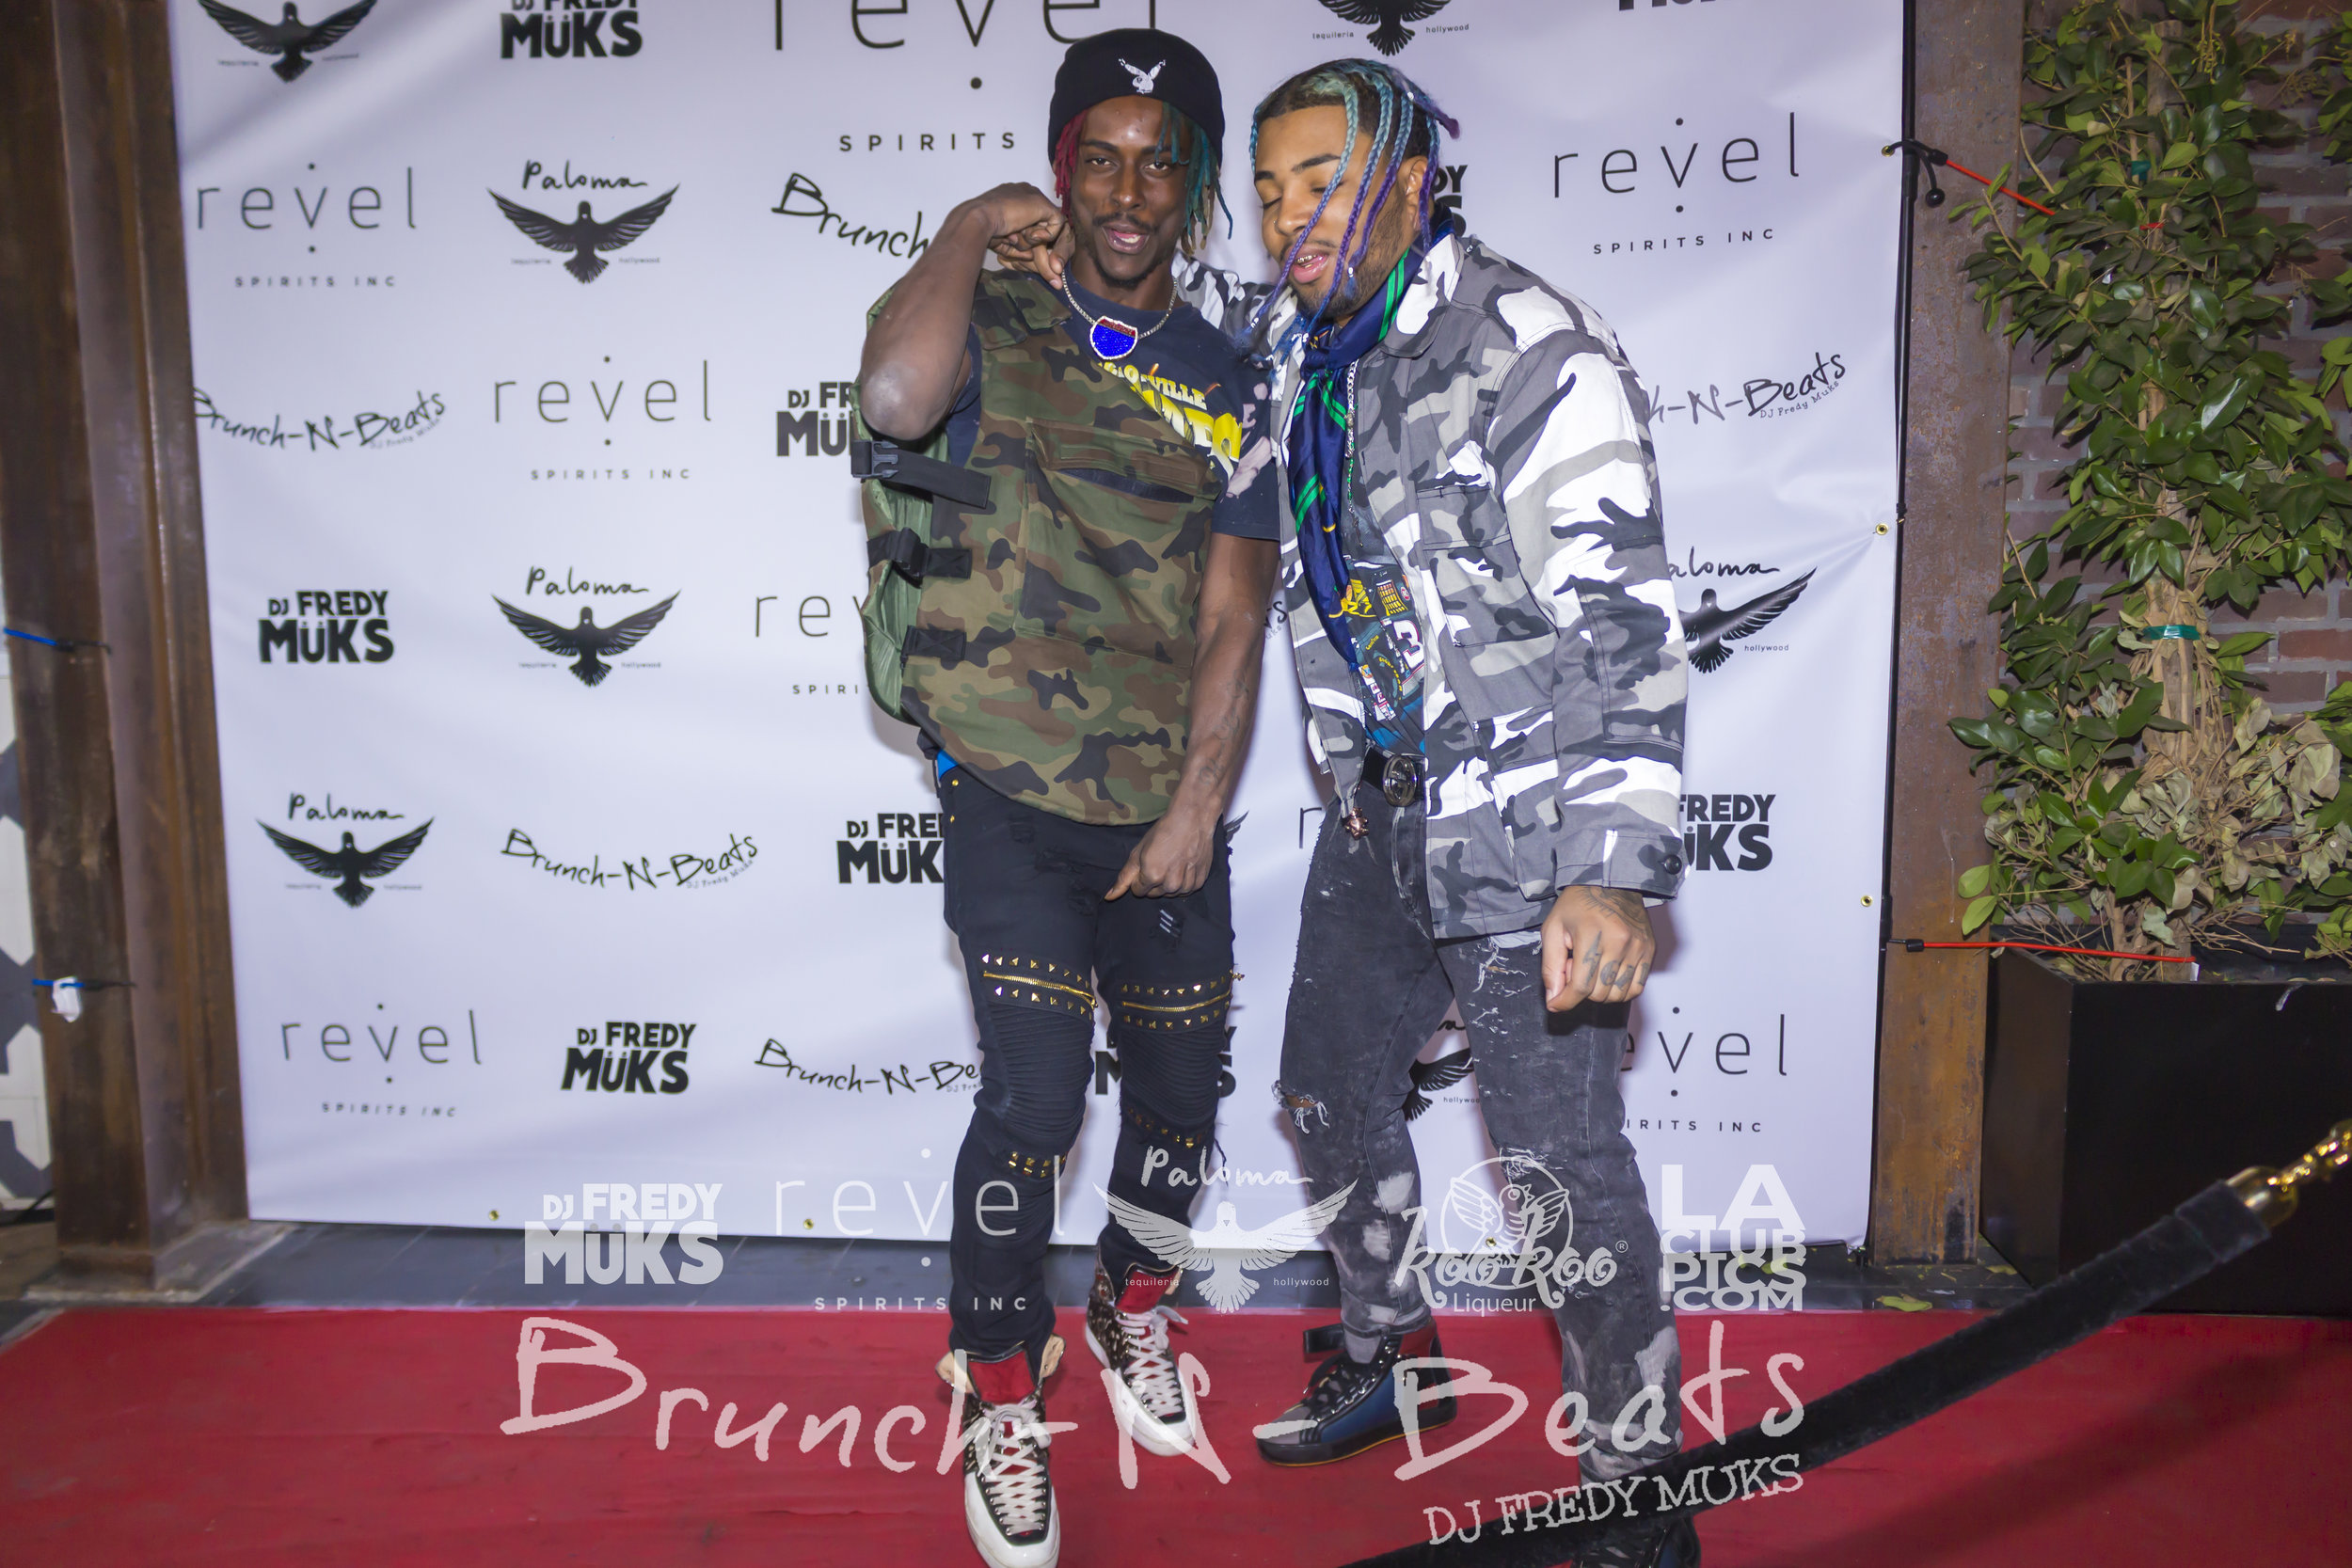 Brunch-N-Beats - Paloma Hollywood - 02-25-18_227.jpg